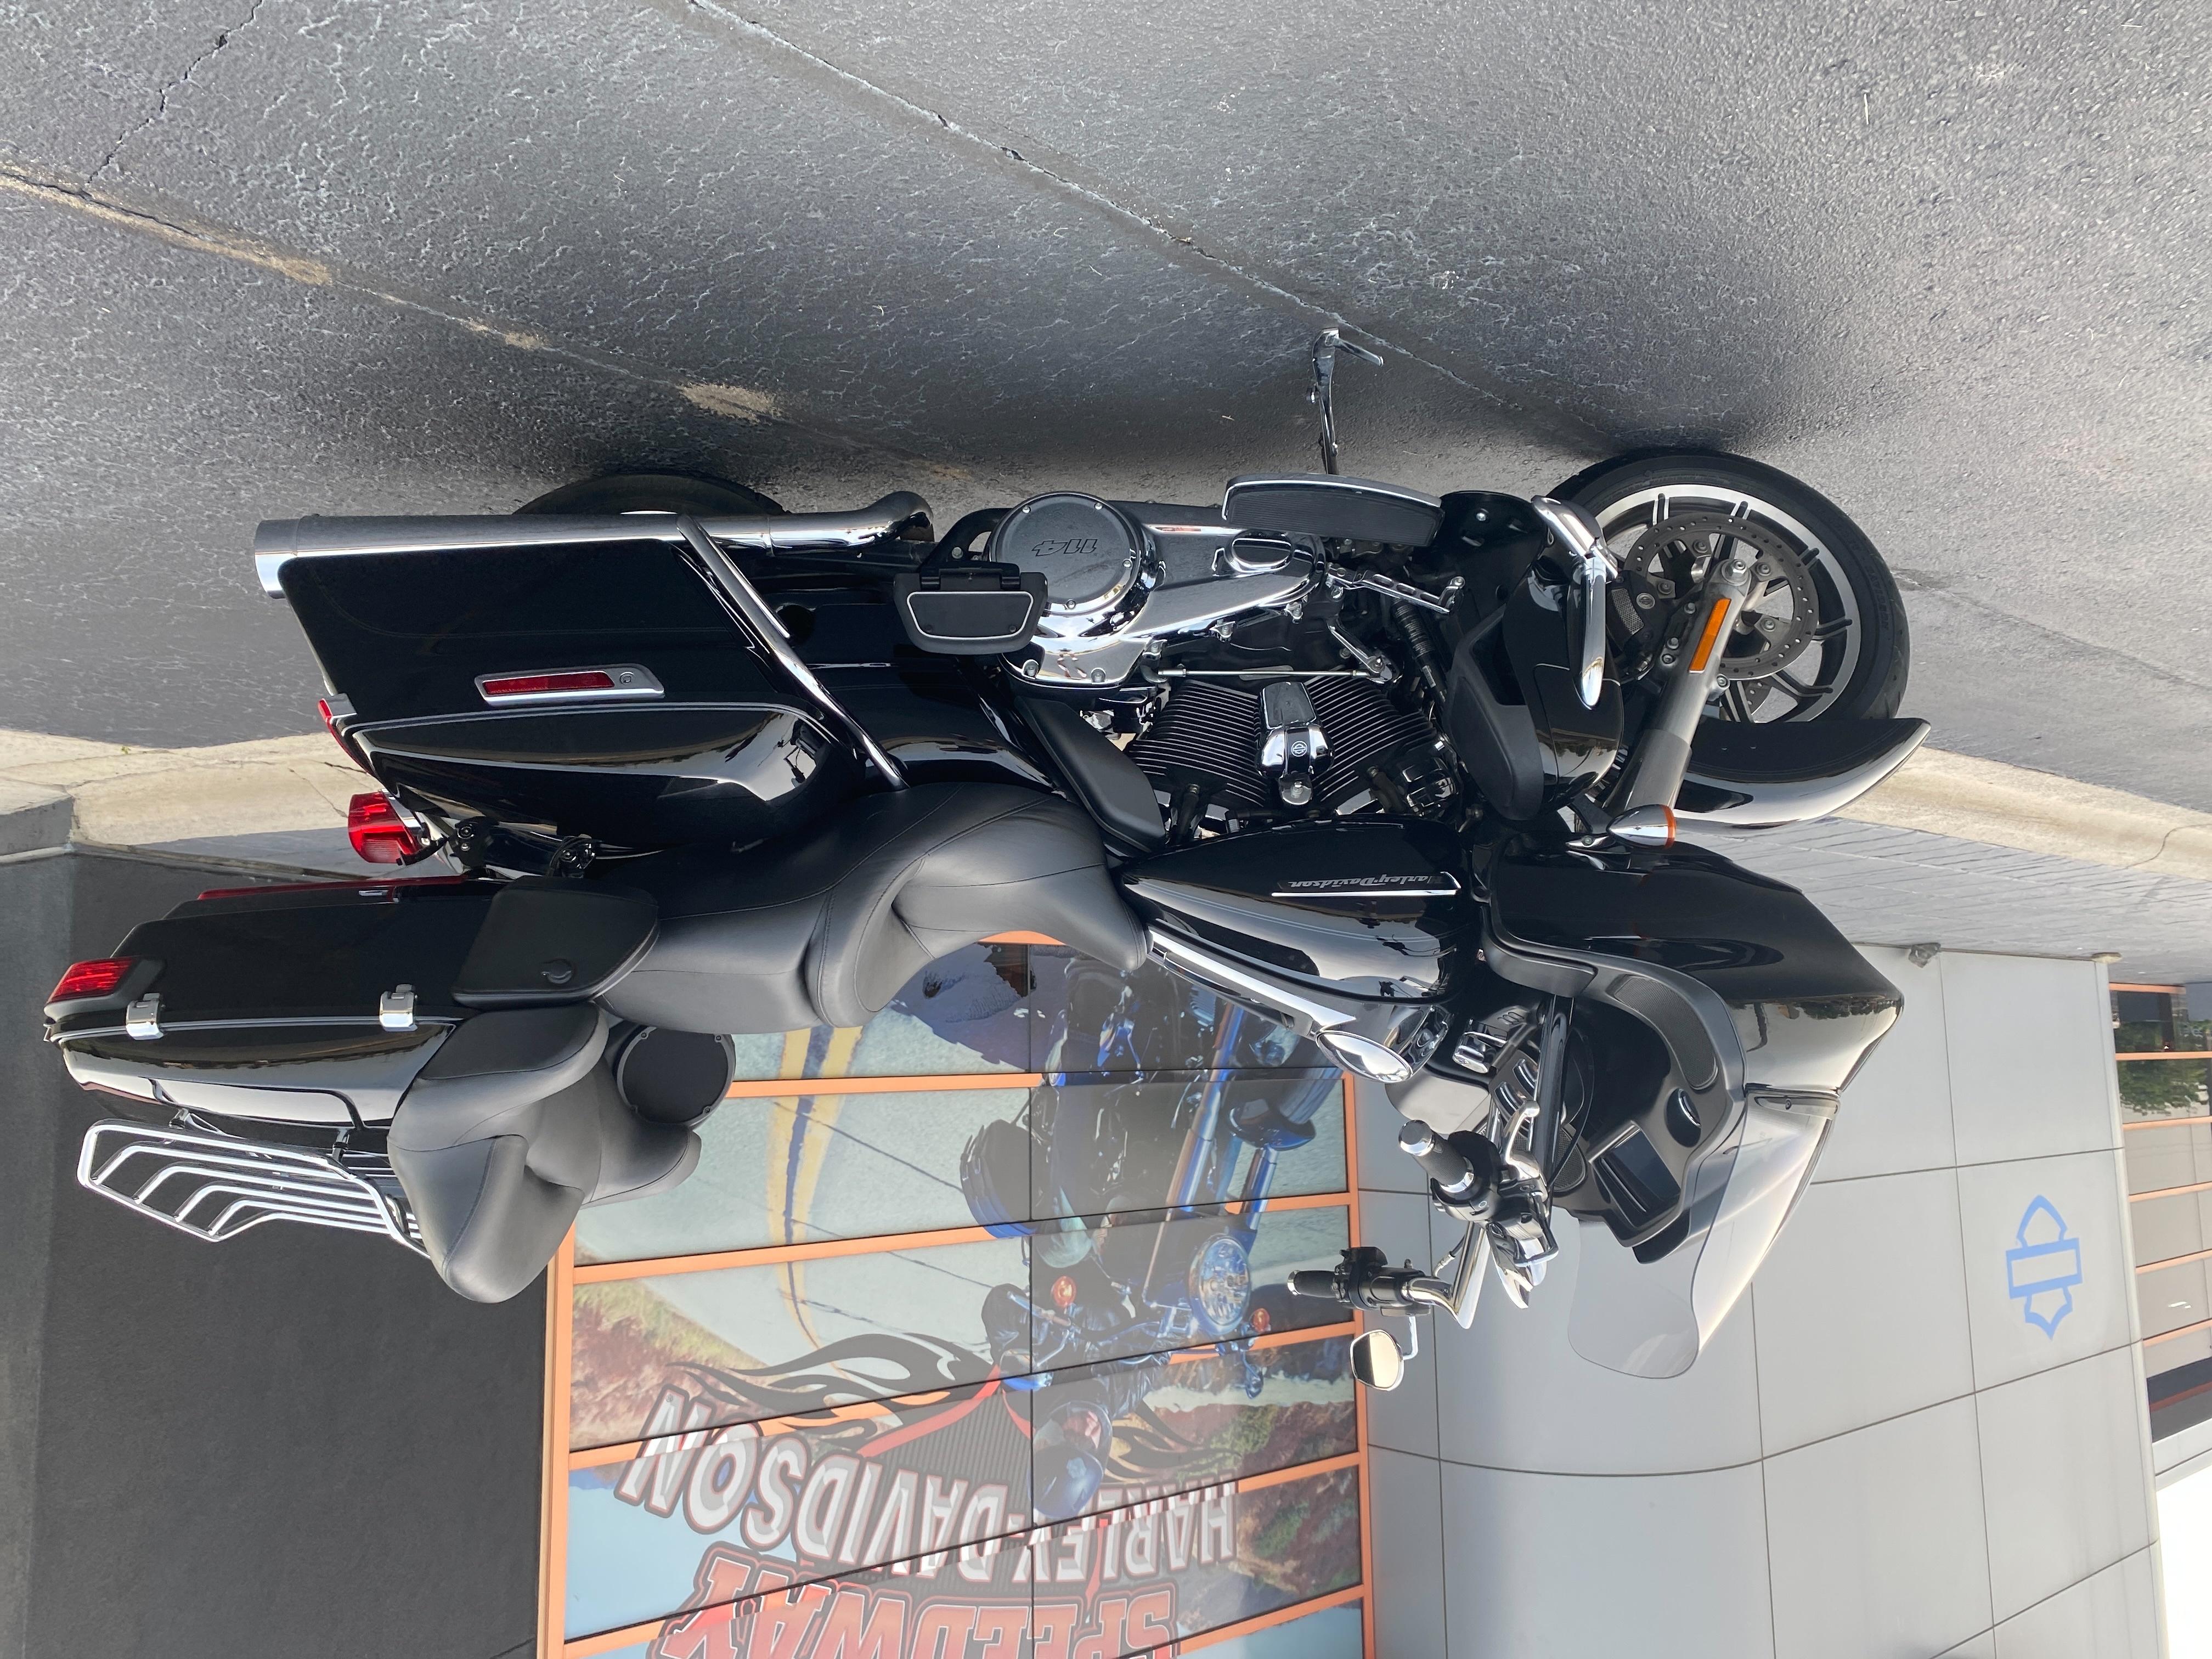 2019 Harley-Davidson Road Glide Ultra at Speedway Harley-Davidson